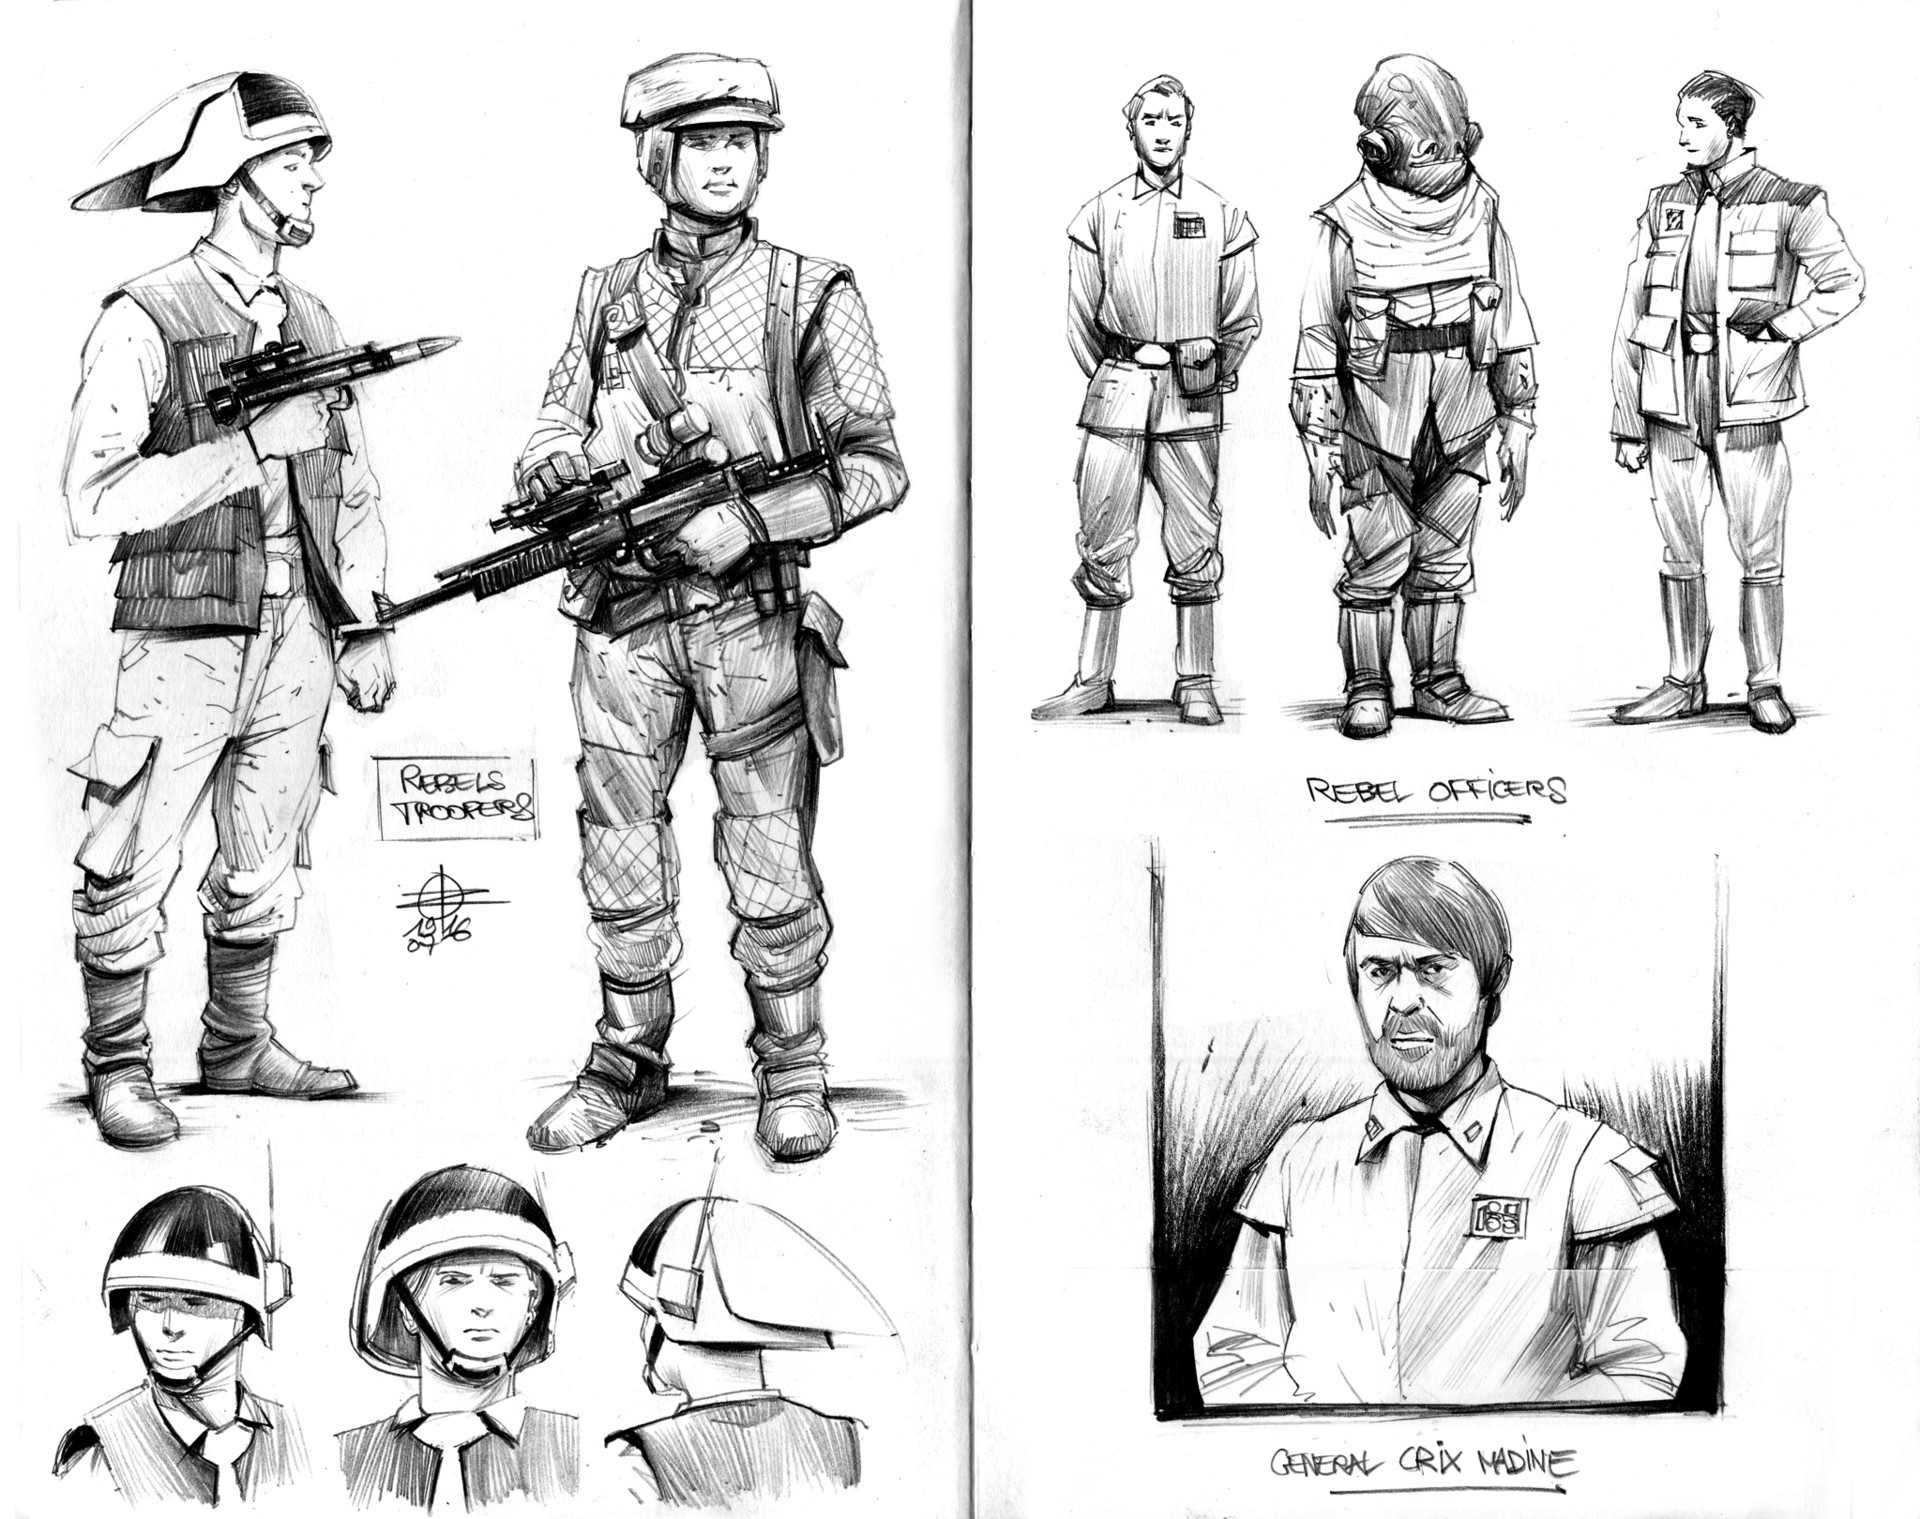 Renaud roche part03 sketches01b